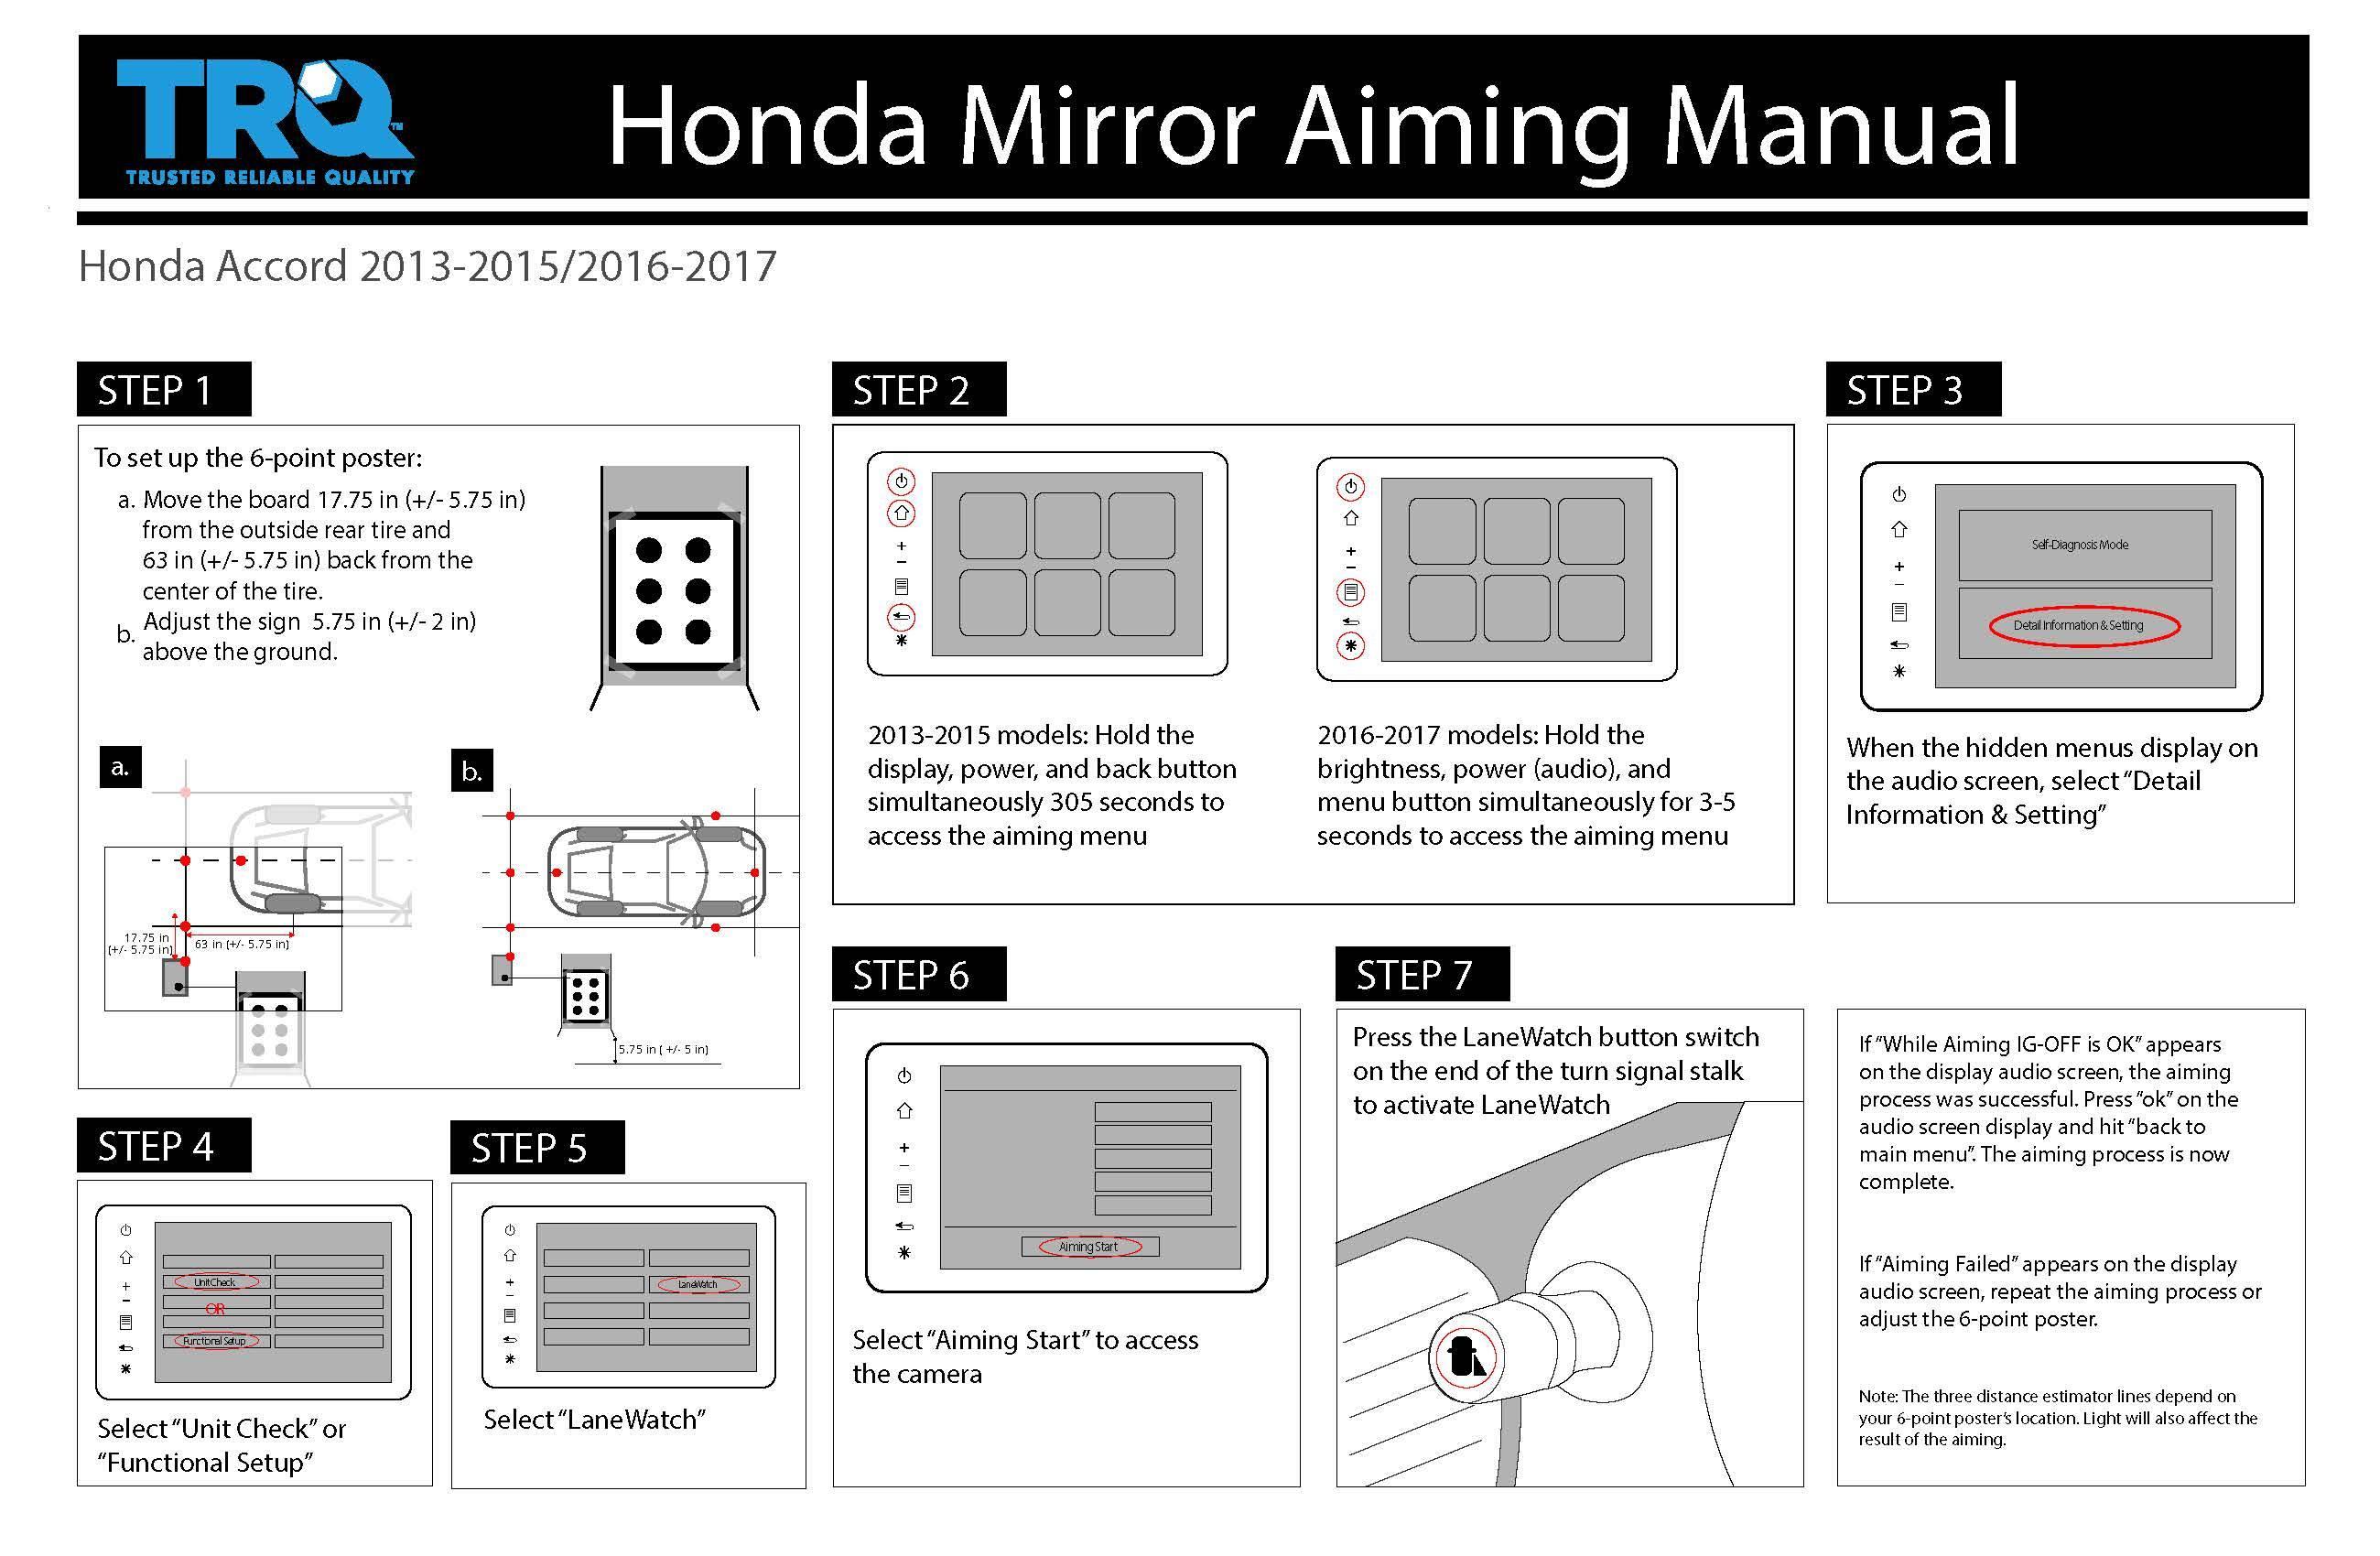 Honda mirror aiming manual for 2013-2015 and 2016-2017 Honda Accord from TRQ.